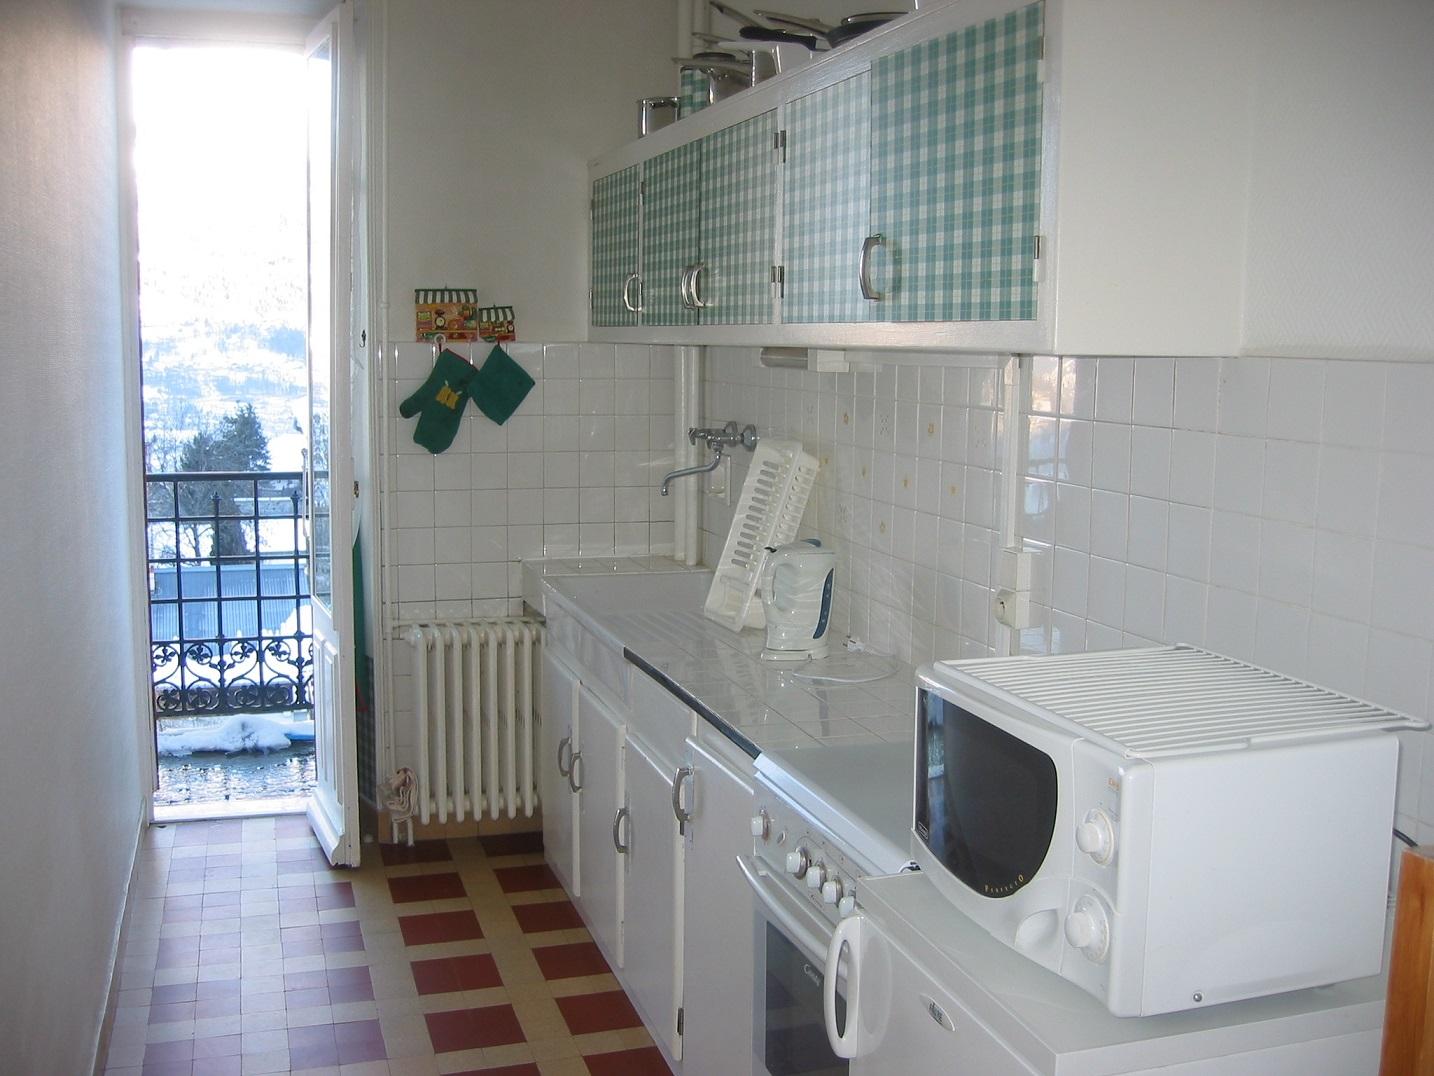 Résidence - Kitchen